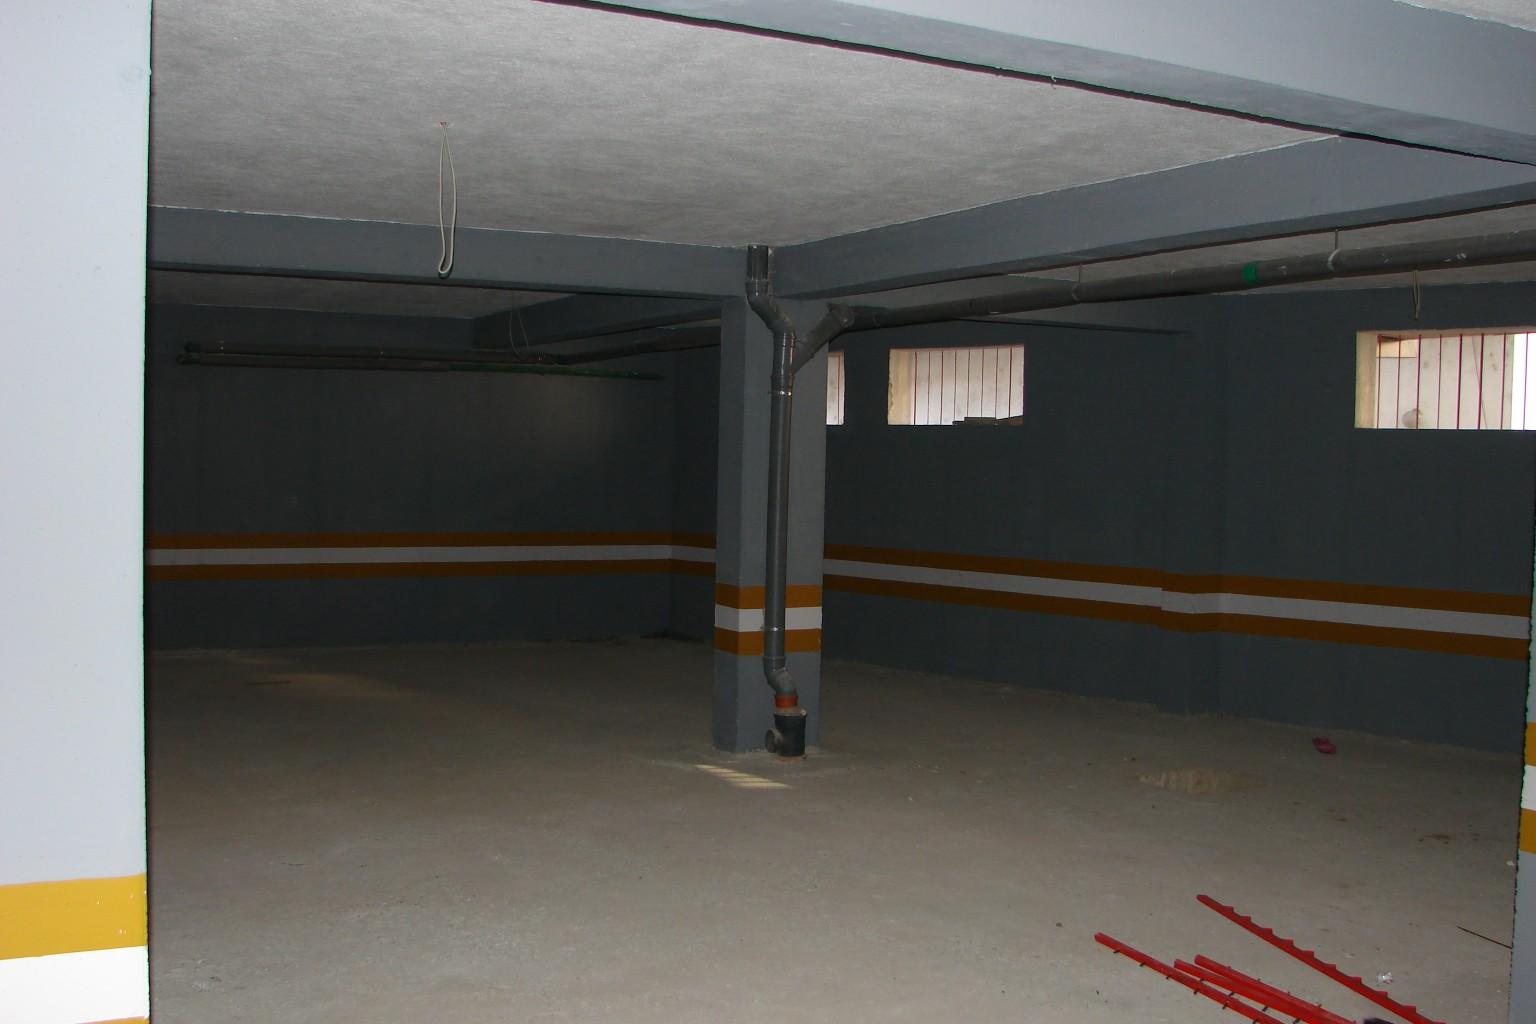 Varda garaža